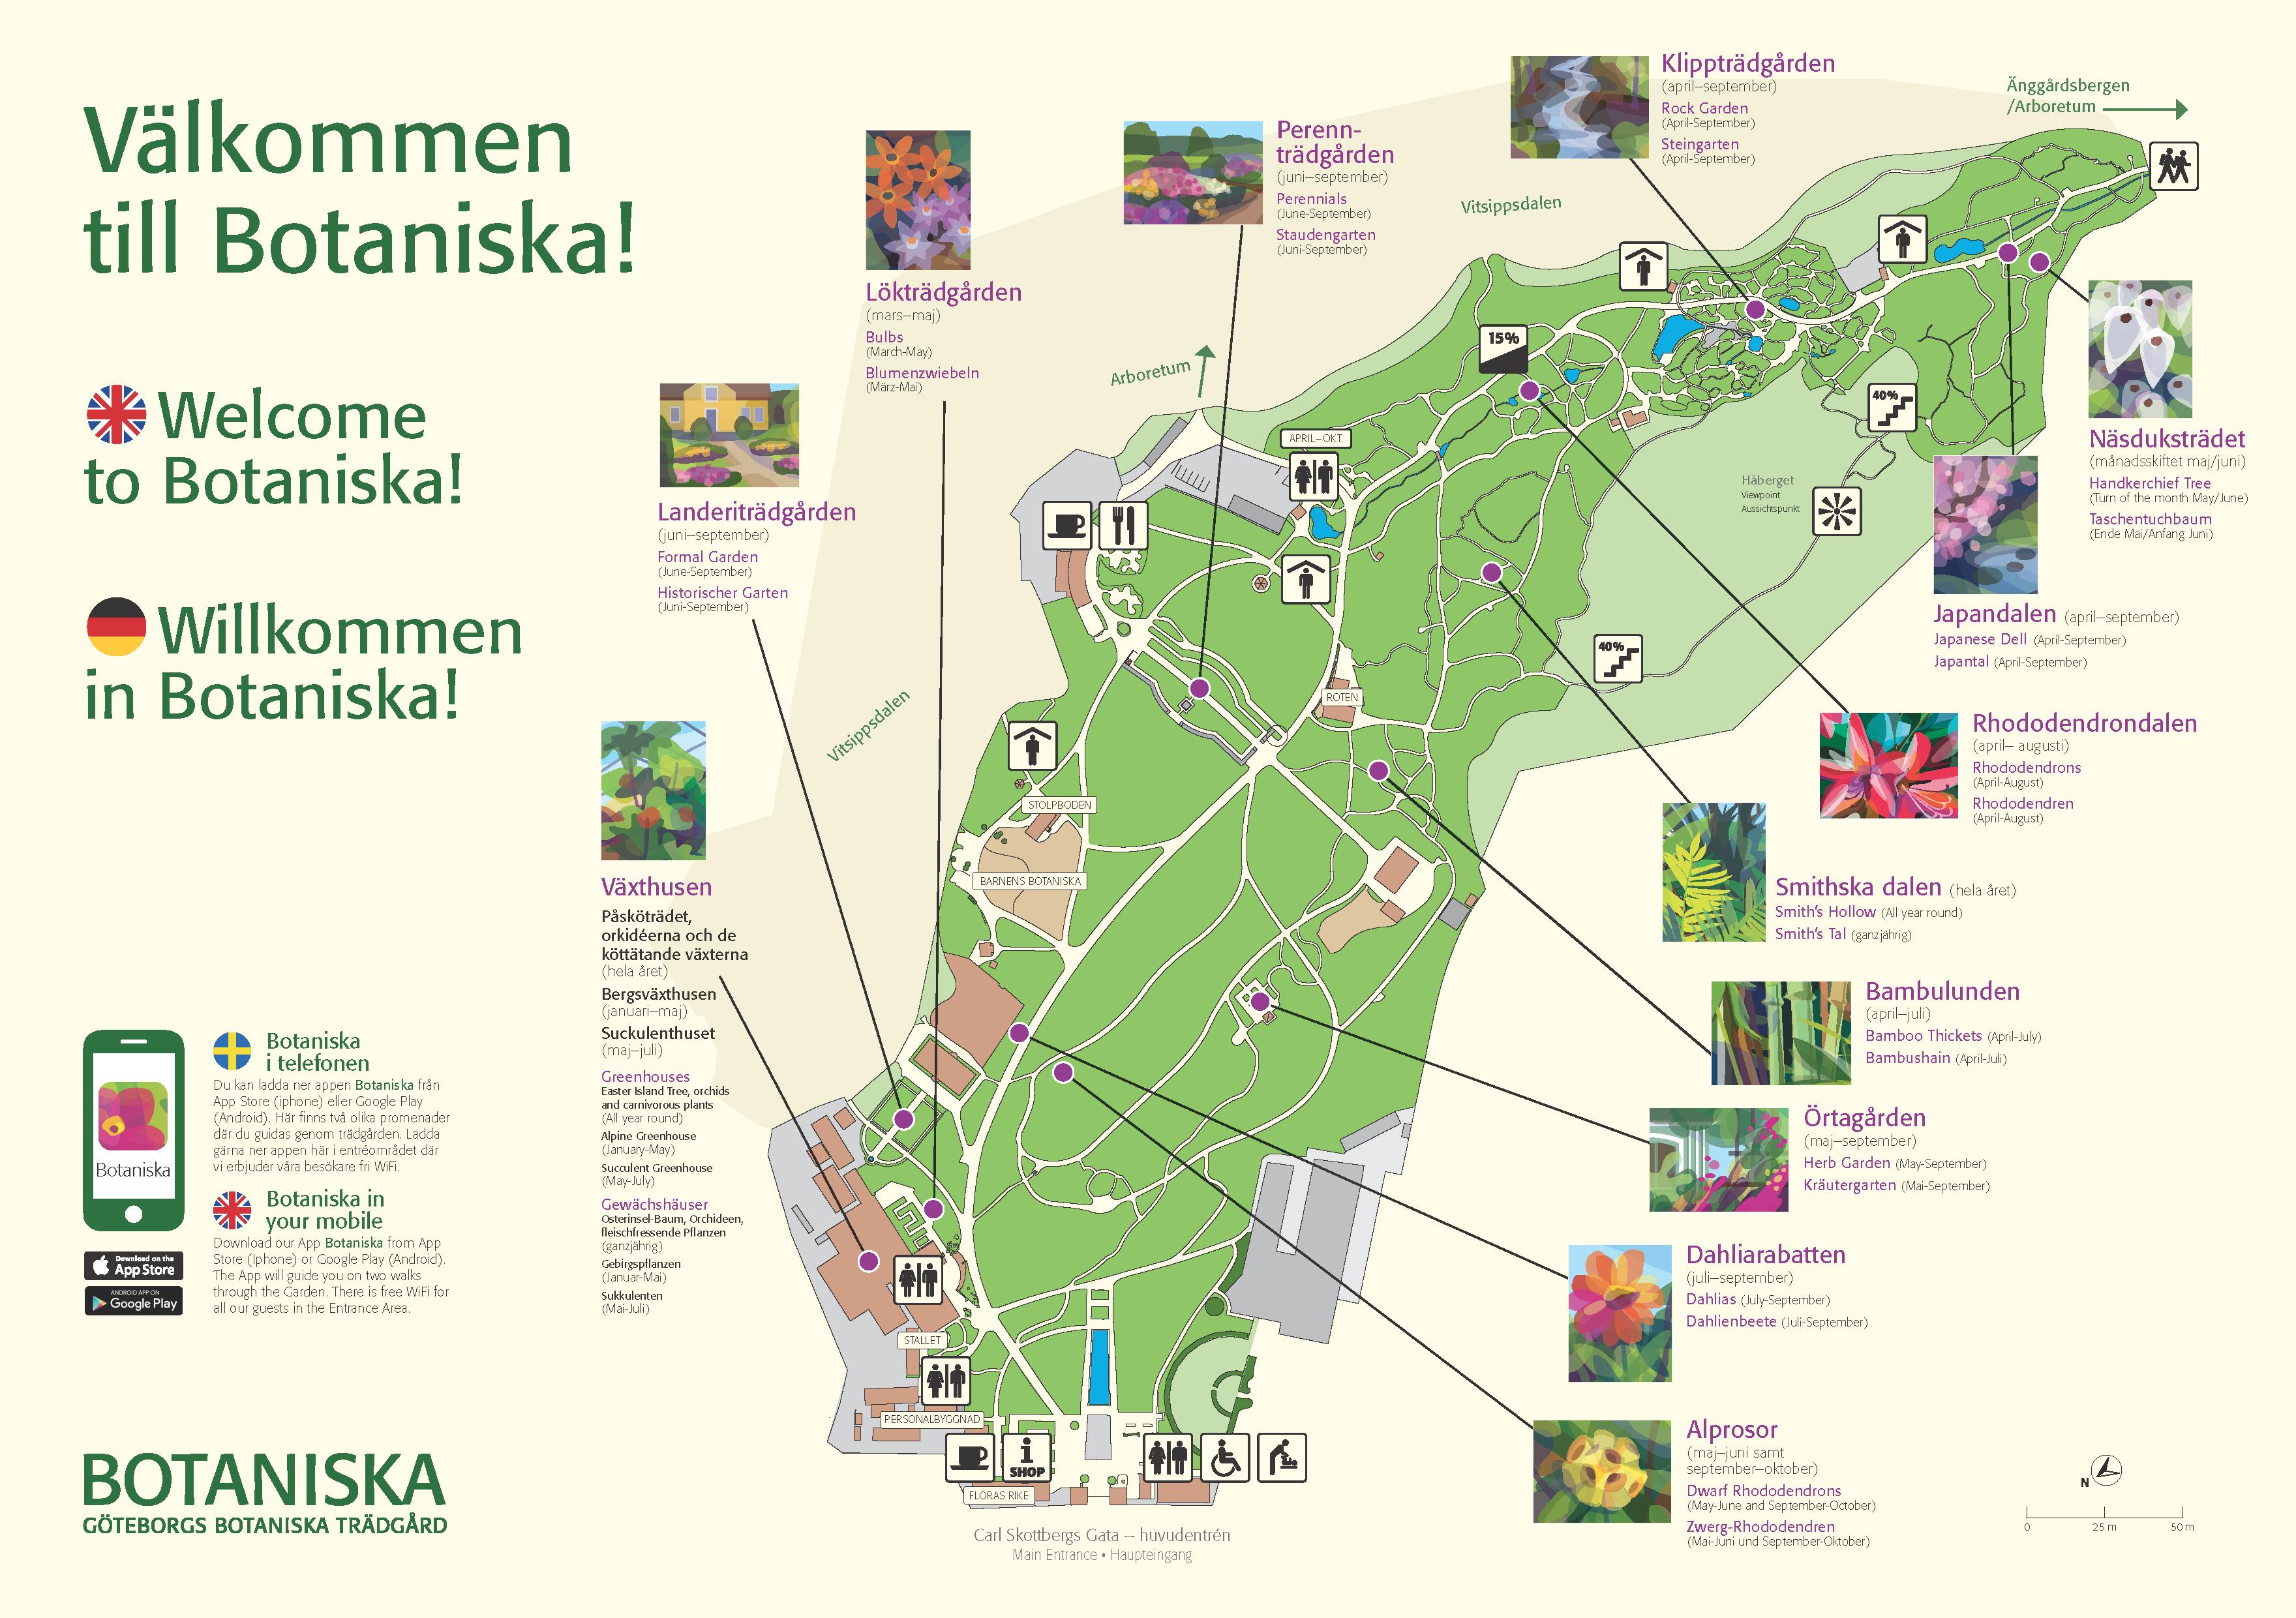 apslätten göteborg karta Garden & Greenhouses   Public_Botaniska apslätten göteborg karta